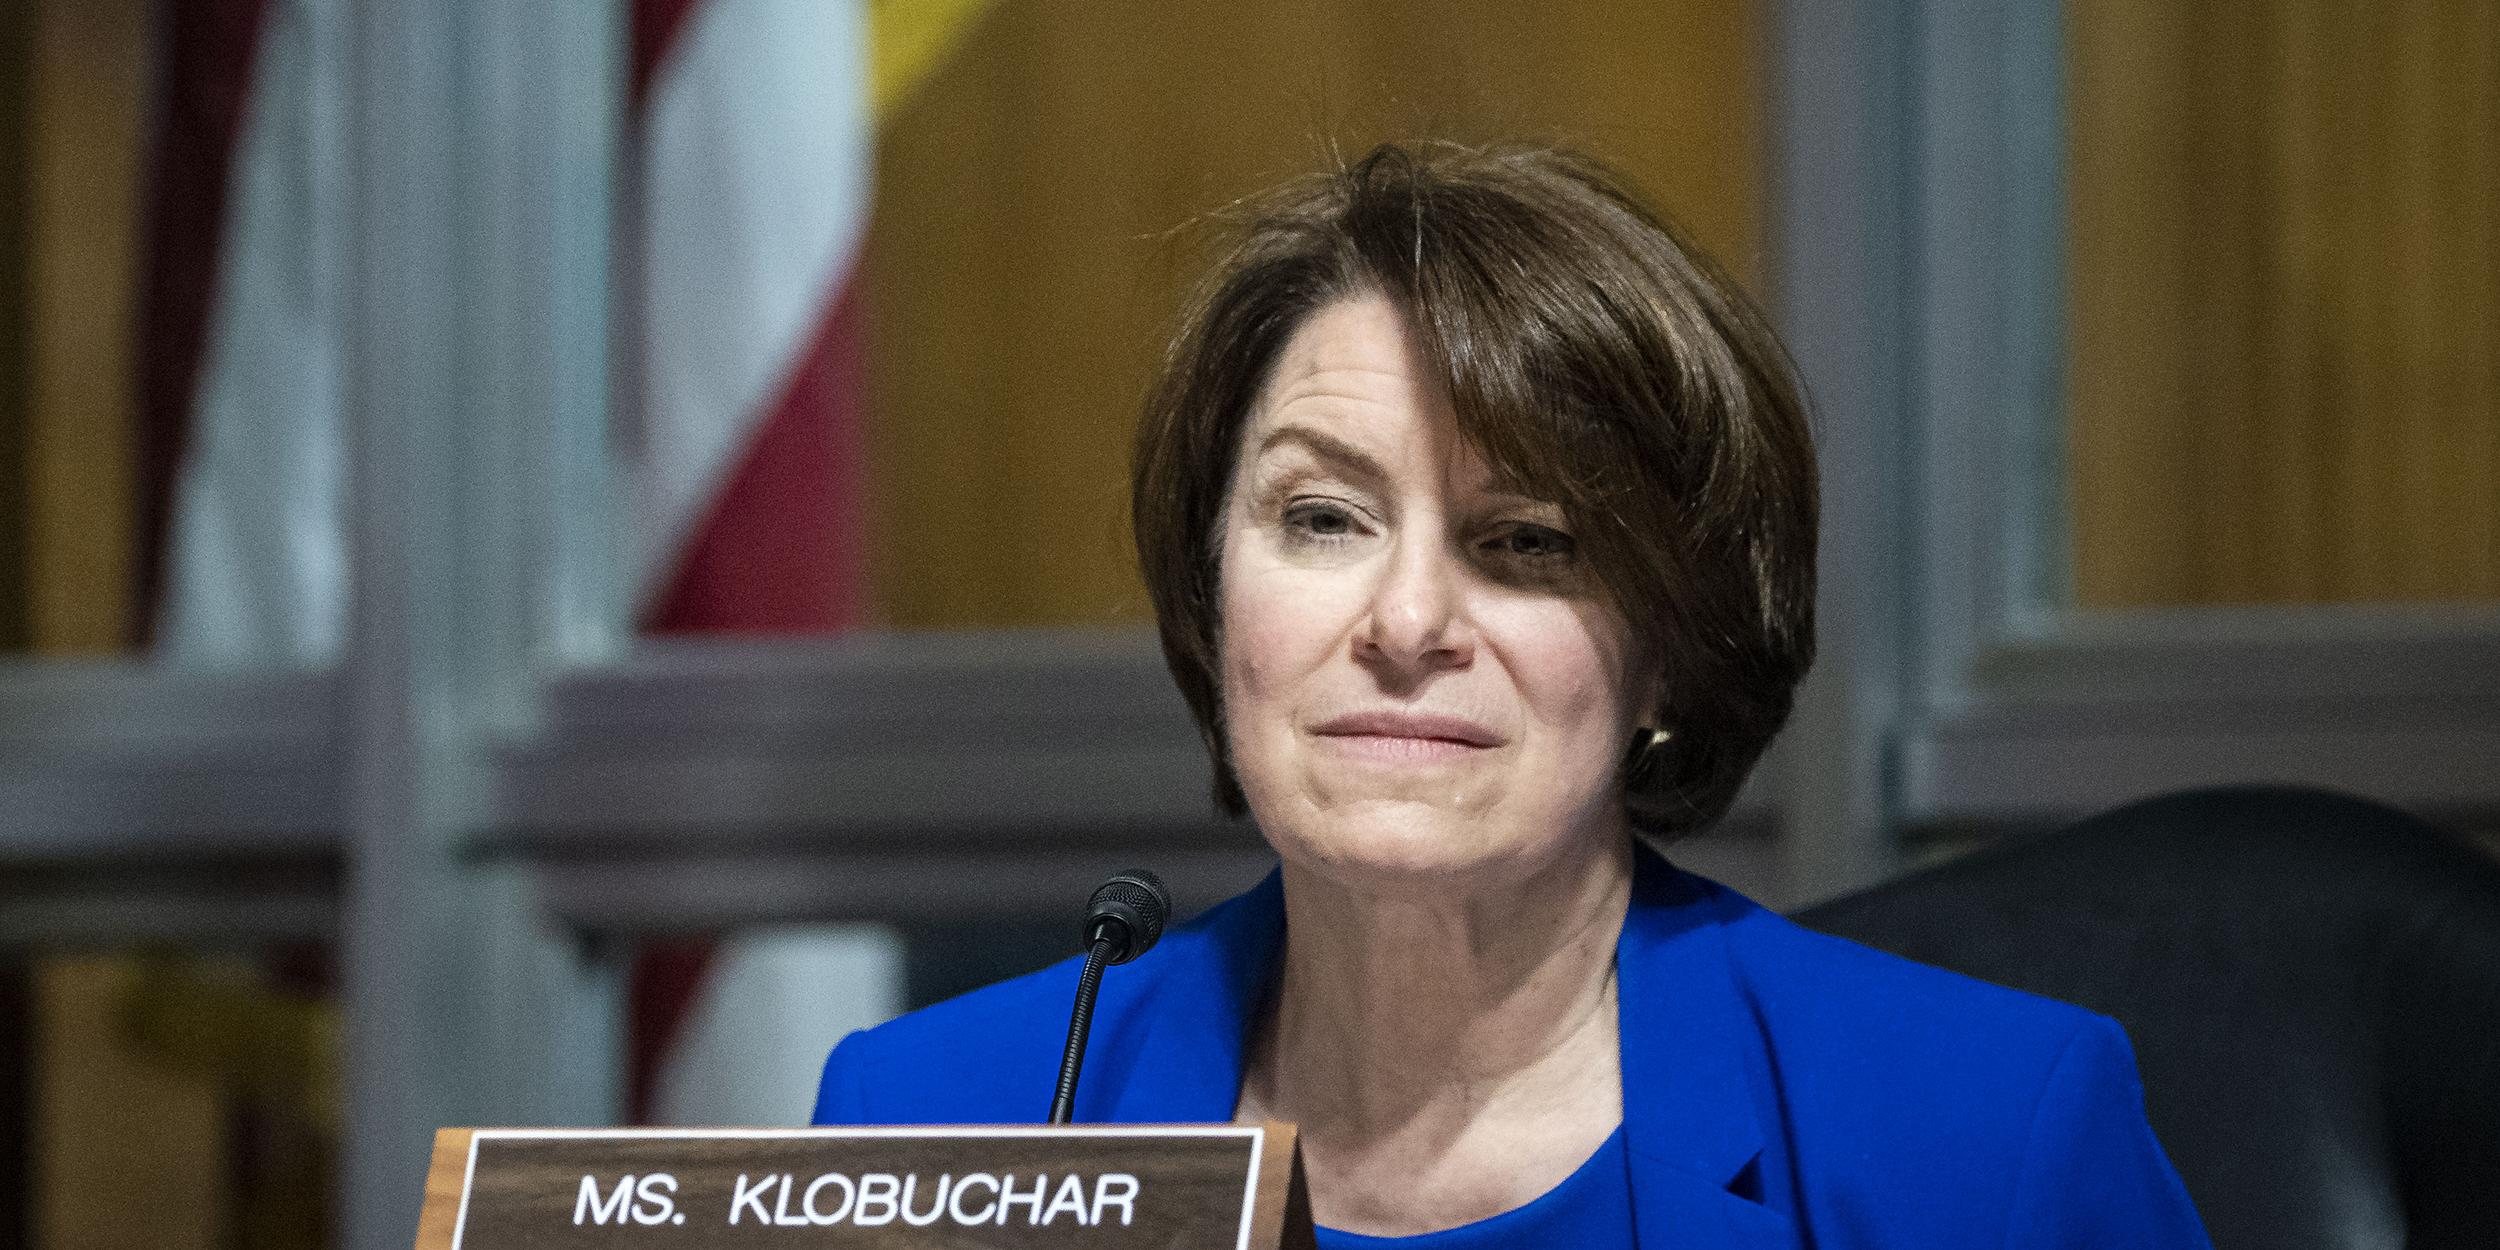 Sen. Amy Klobuchar reveals breast cancer diagnosis, says treatment 'went well'